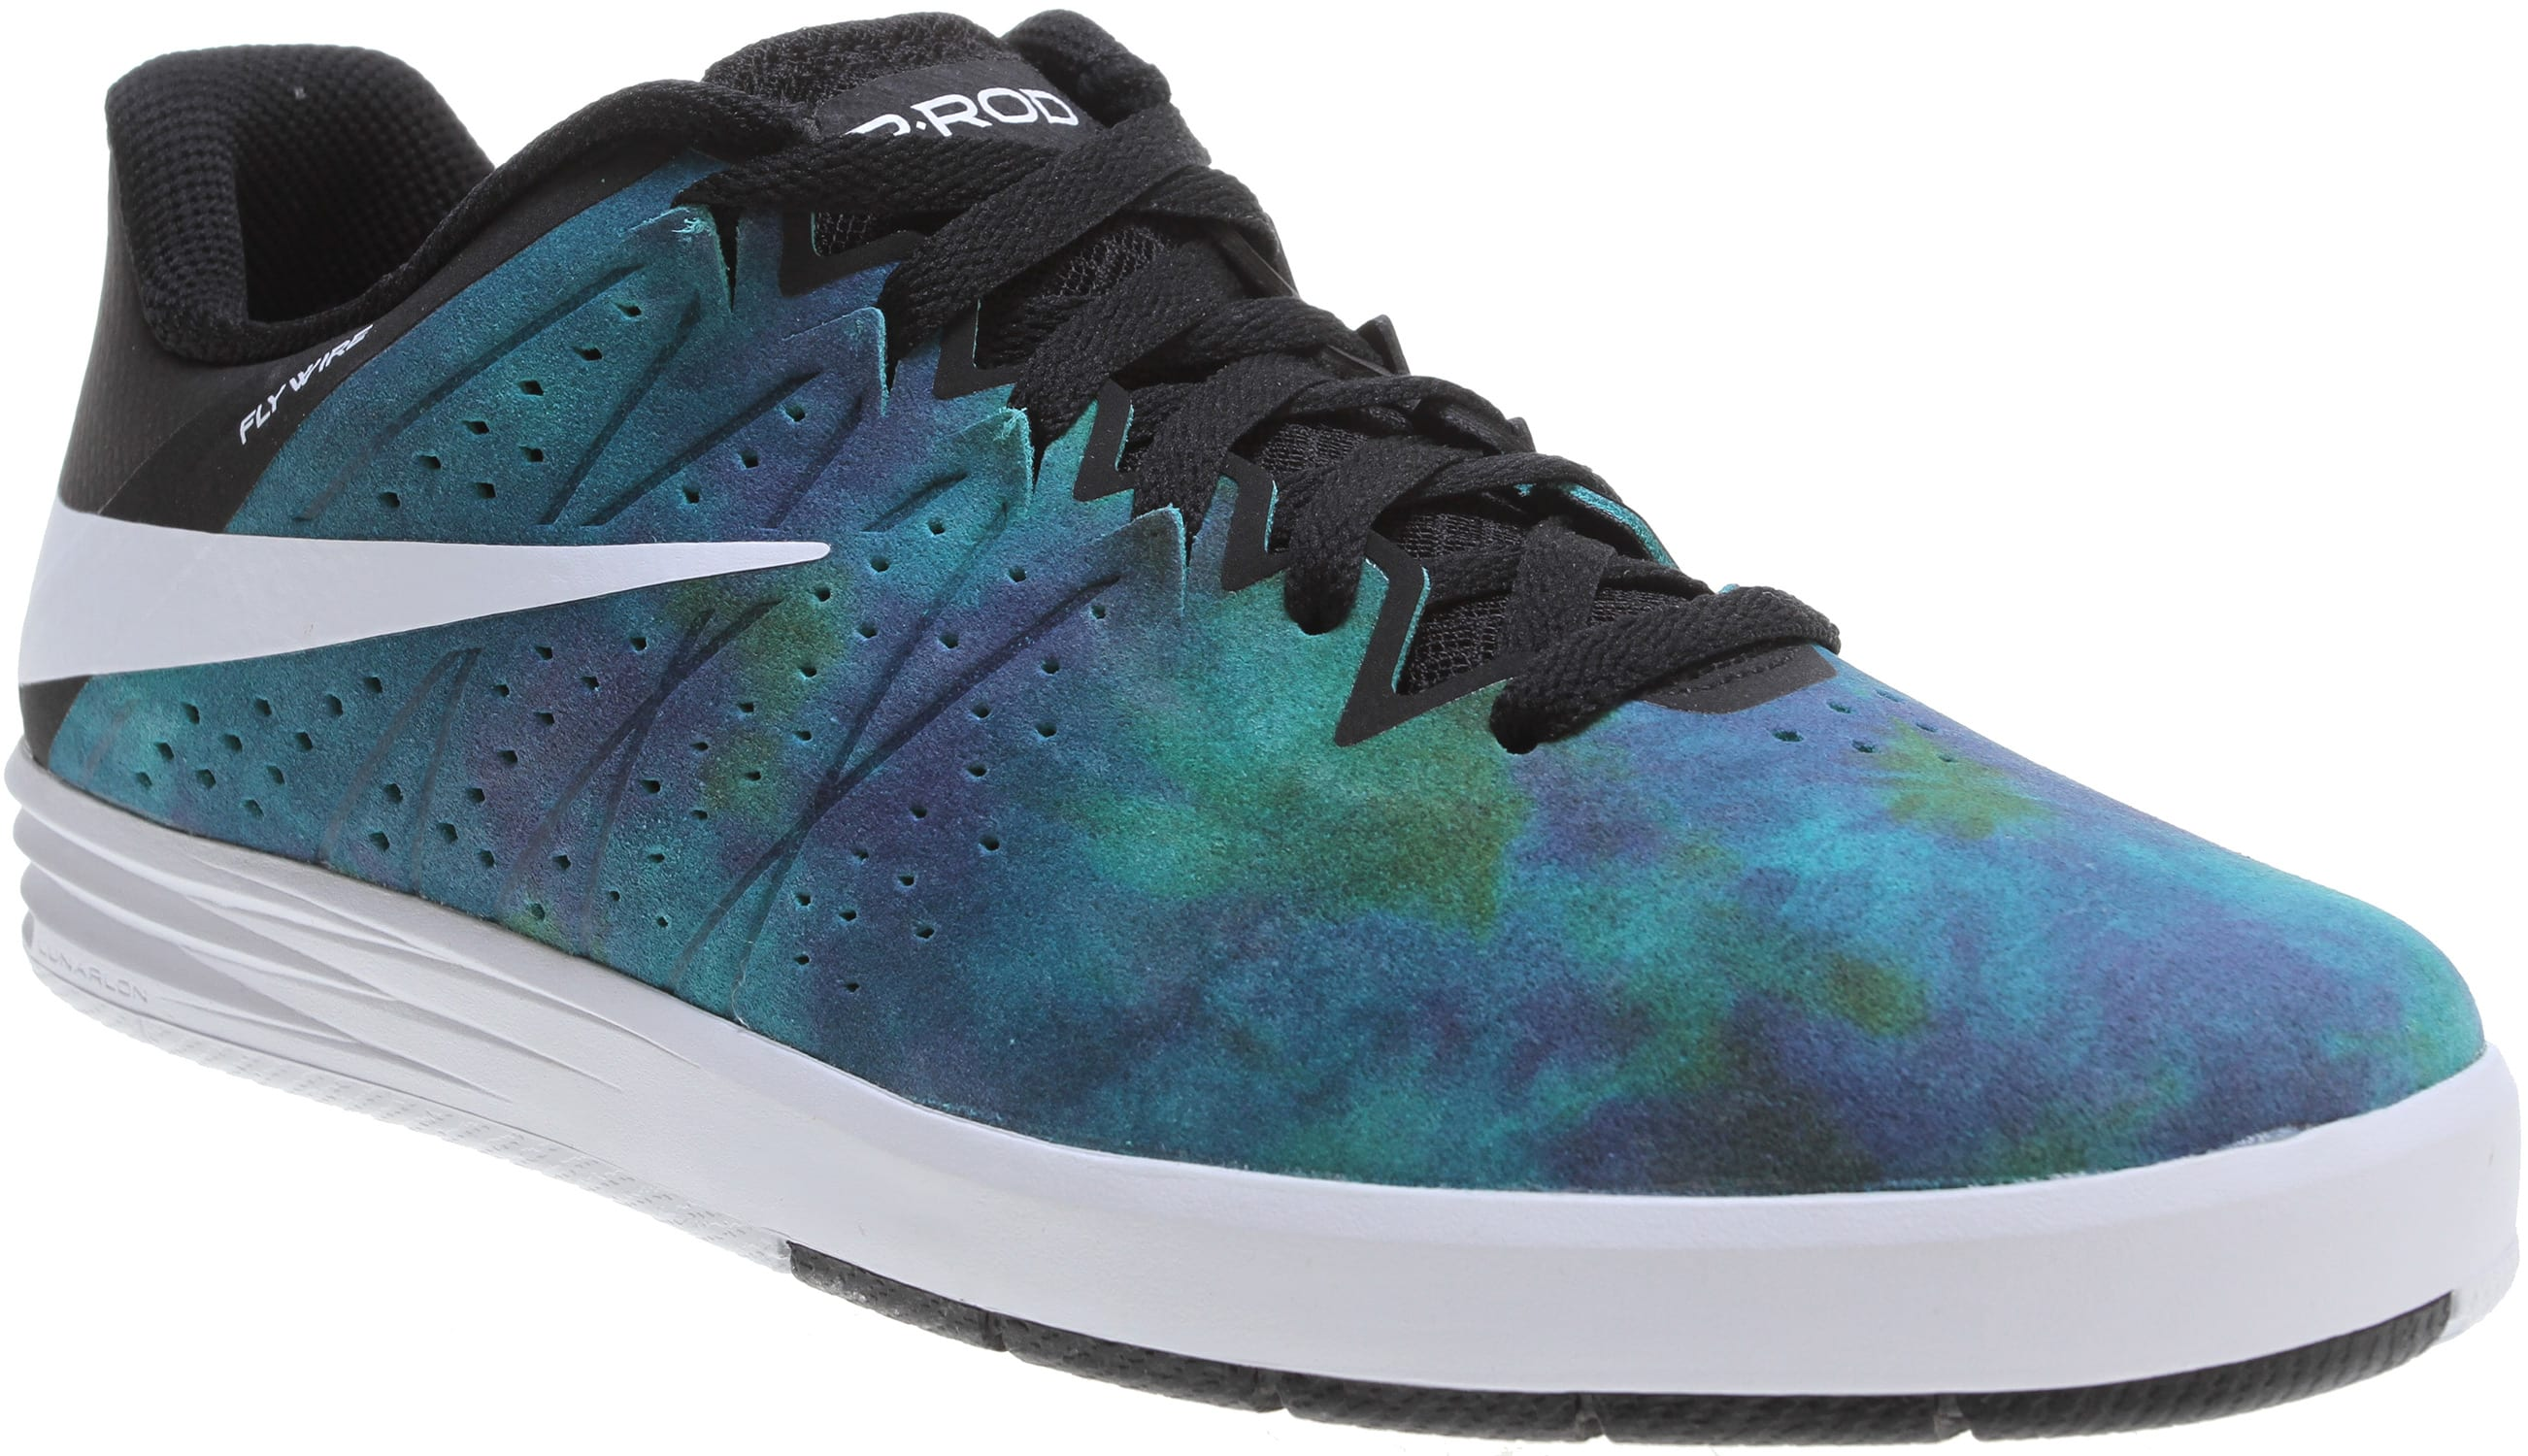 reputable site 2a86d 6f6f6 Nike SB Paul Rodriguez Ctd Skate Shoes - thumbnail 2